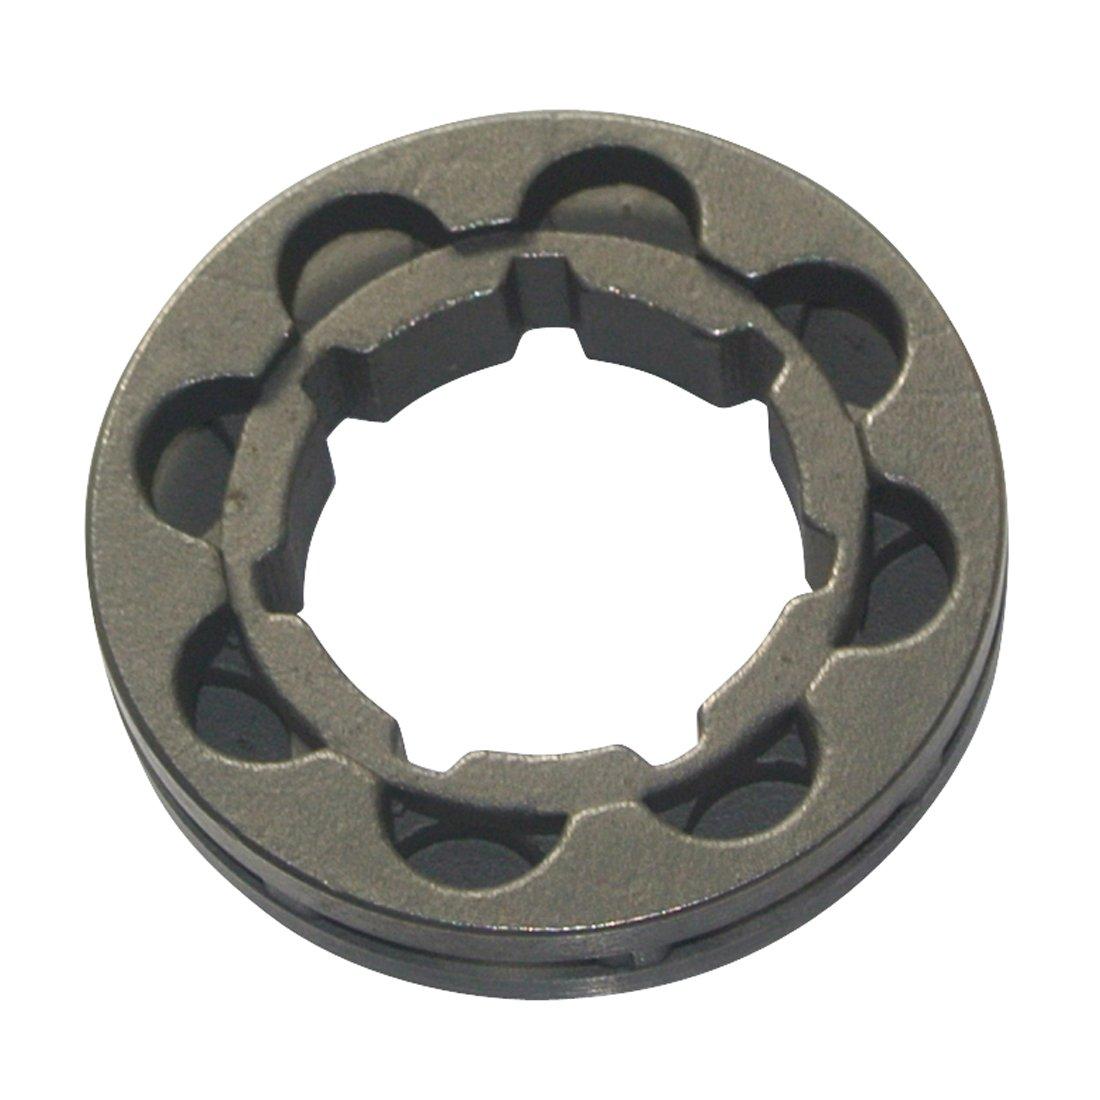 New 3//8-8 8 Teeth 7 Spline Chain Sprocket Rim For STIHL MS880 088 090 HUSQVARNA 394